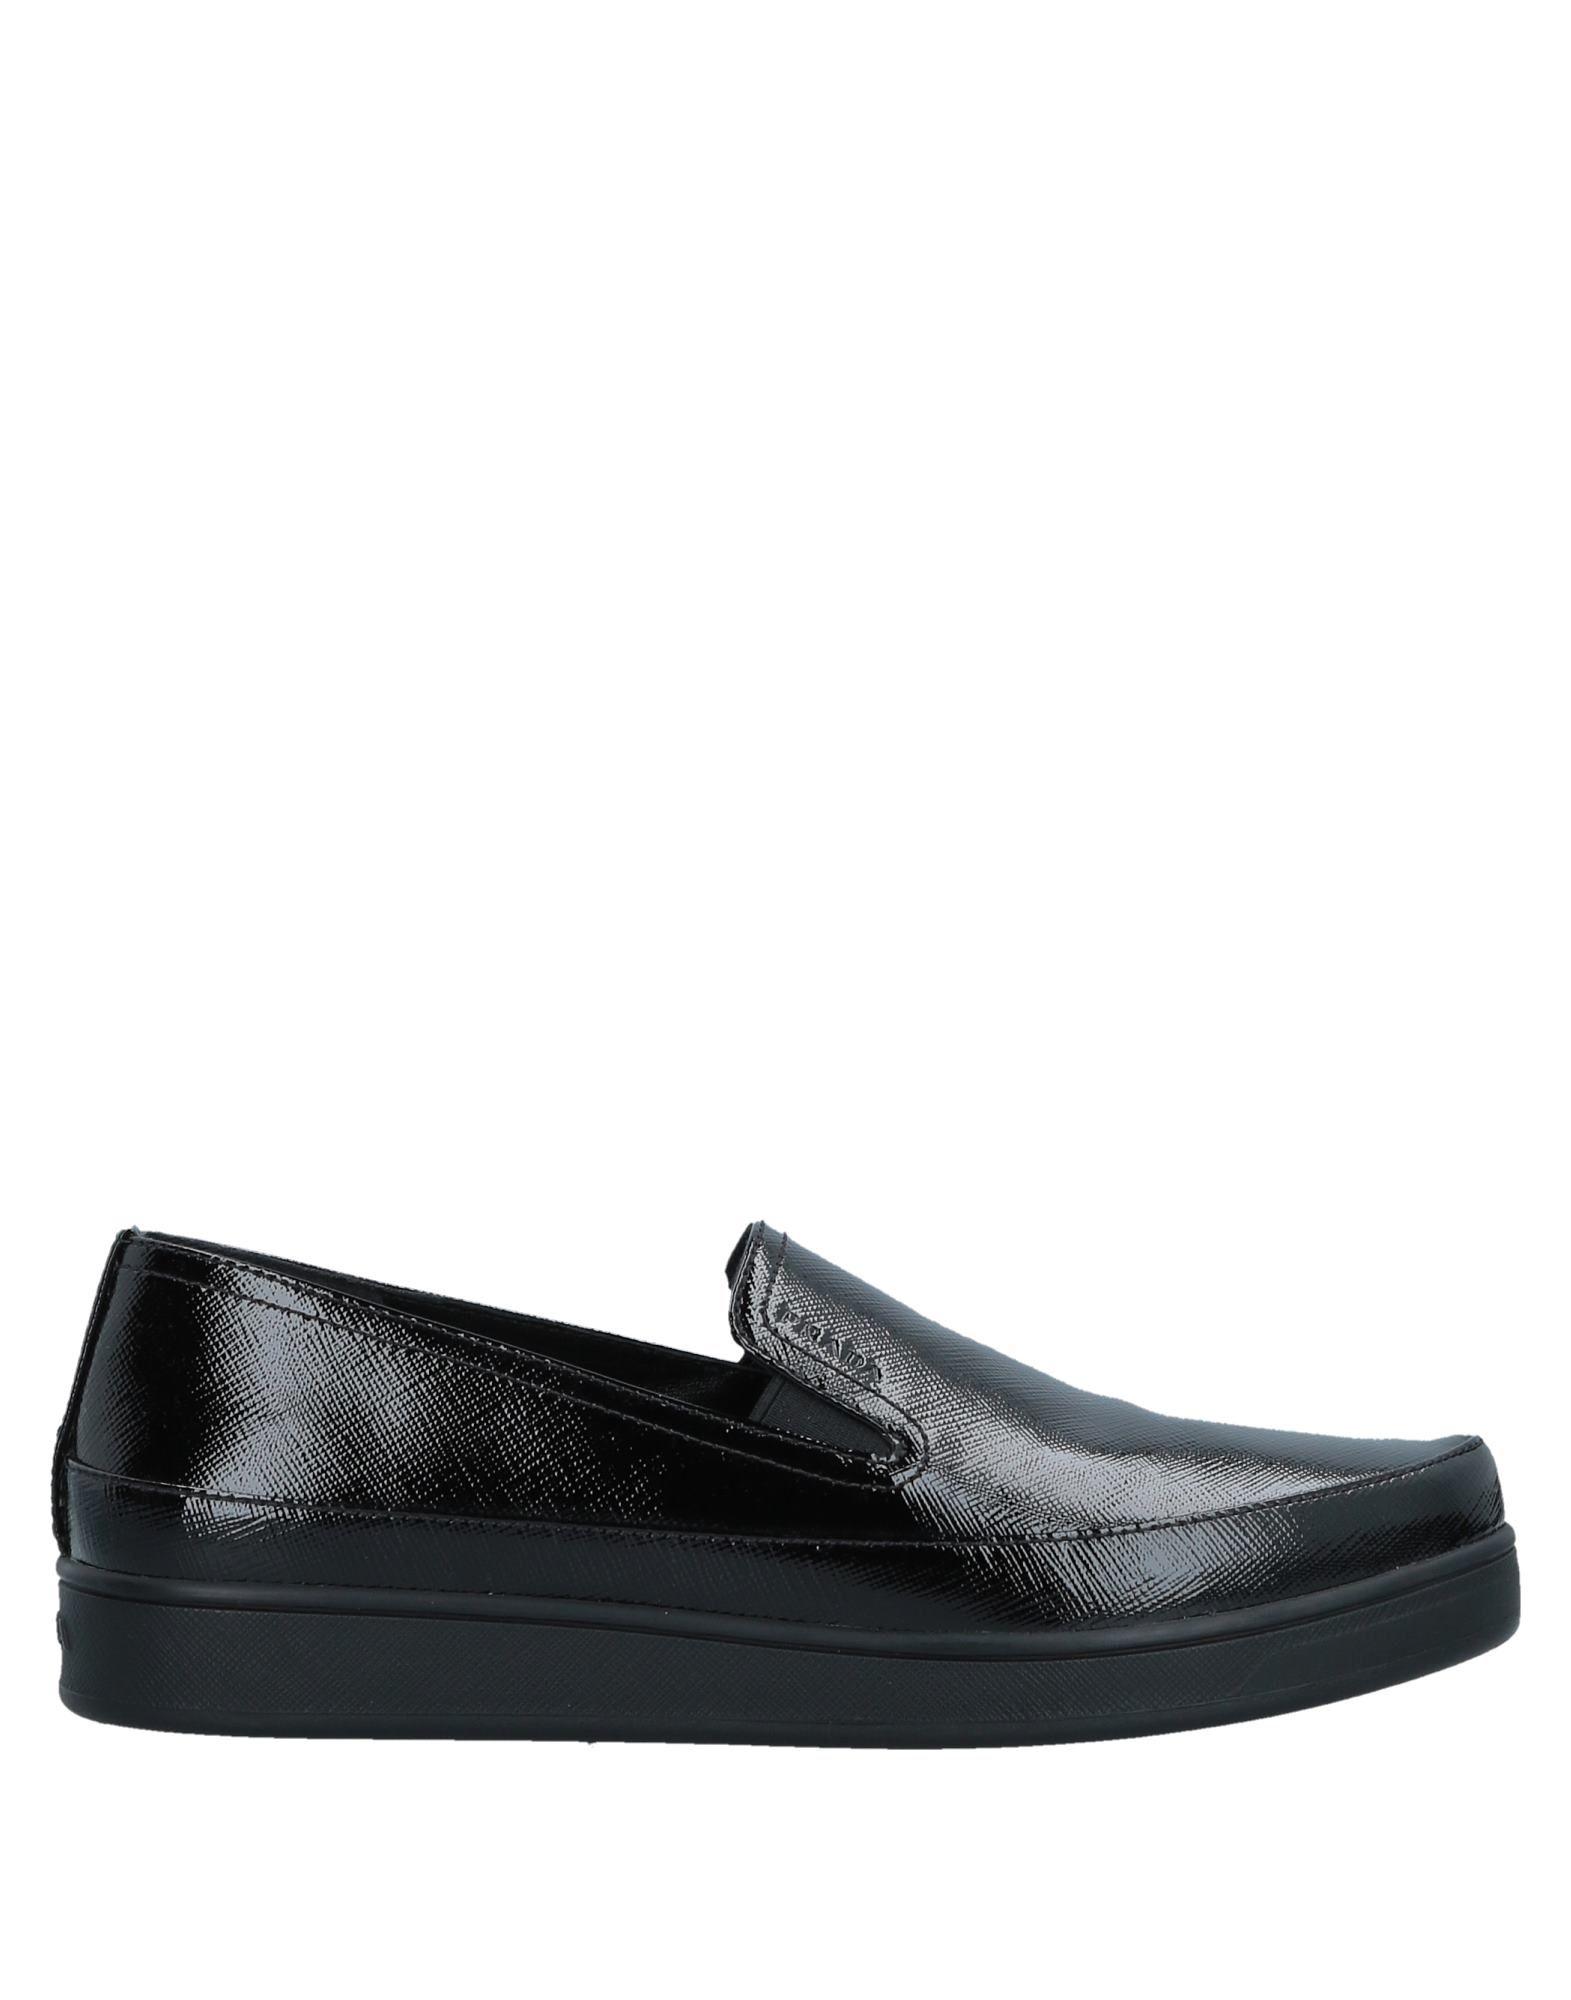 Haltbare Mode billige Schuhe Prada Mokassins Damen  11522334TA Heiße Schuhe